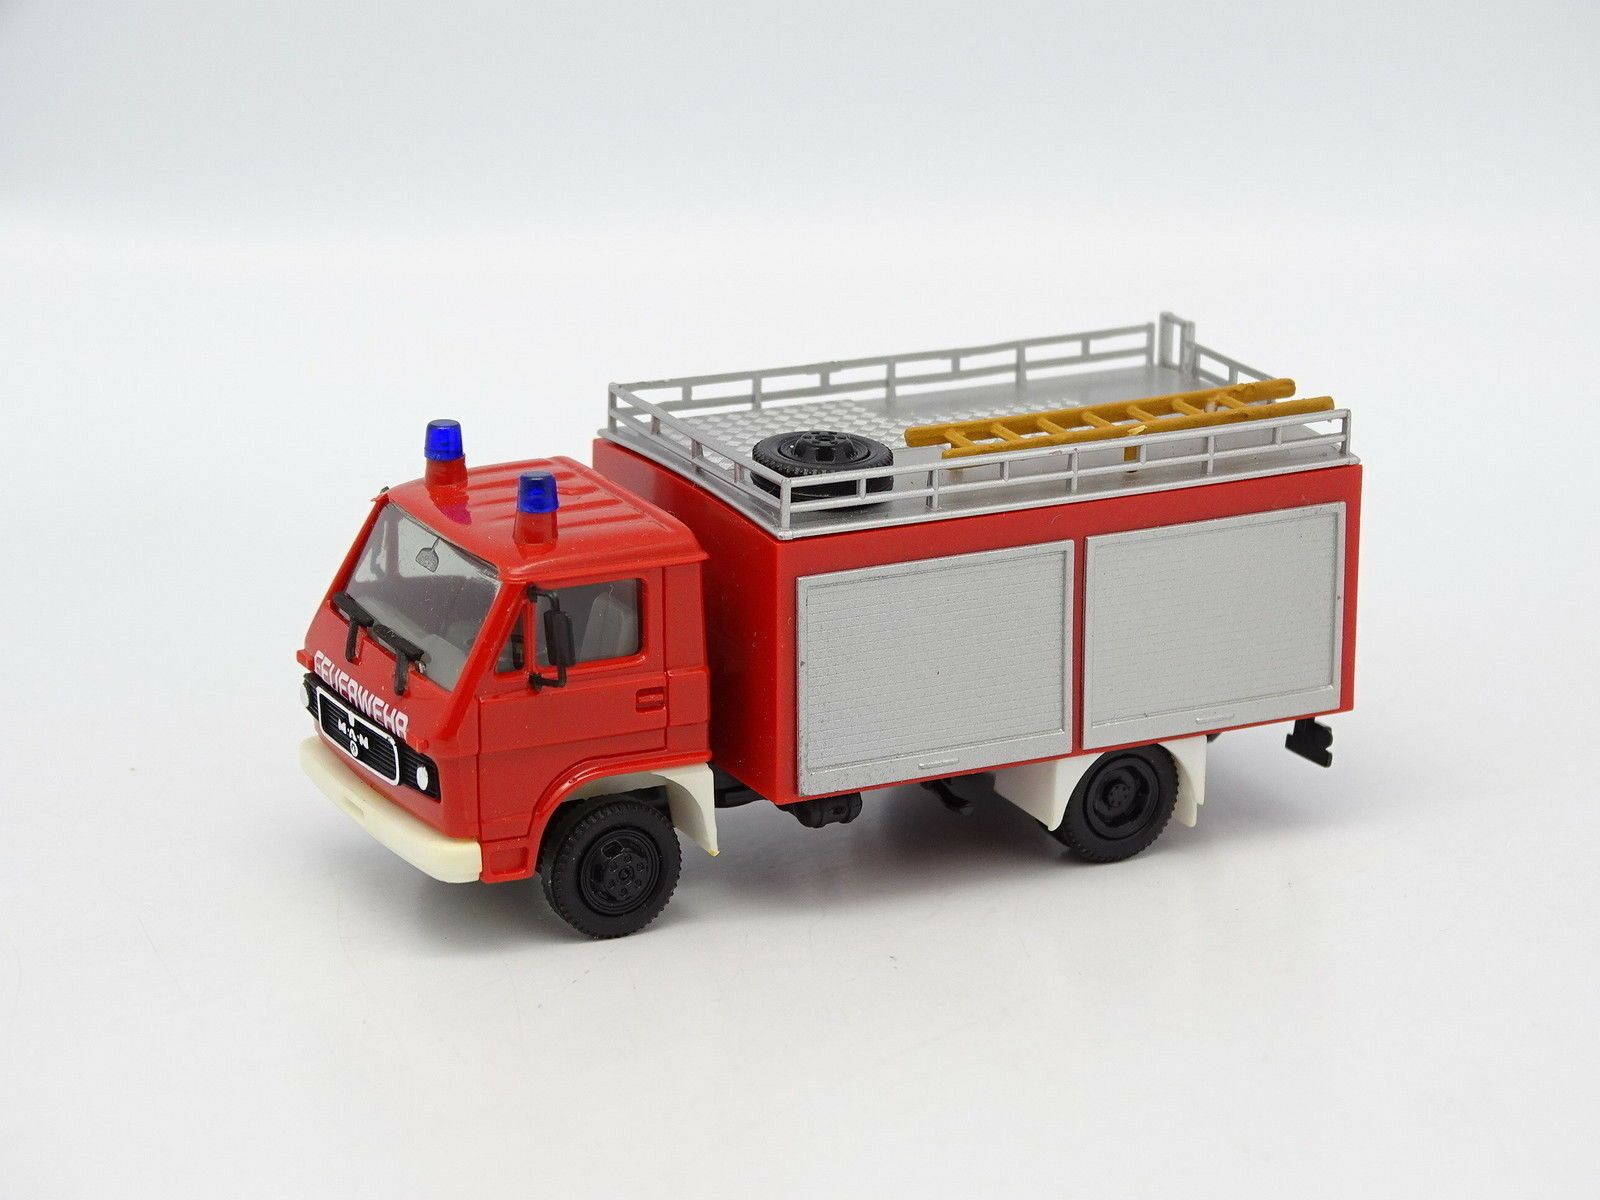 Roco 1 87 HO - - - MAN VW Feuerwehr Firefighters 427219